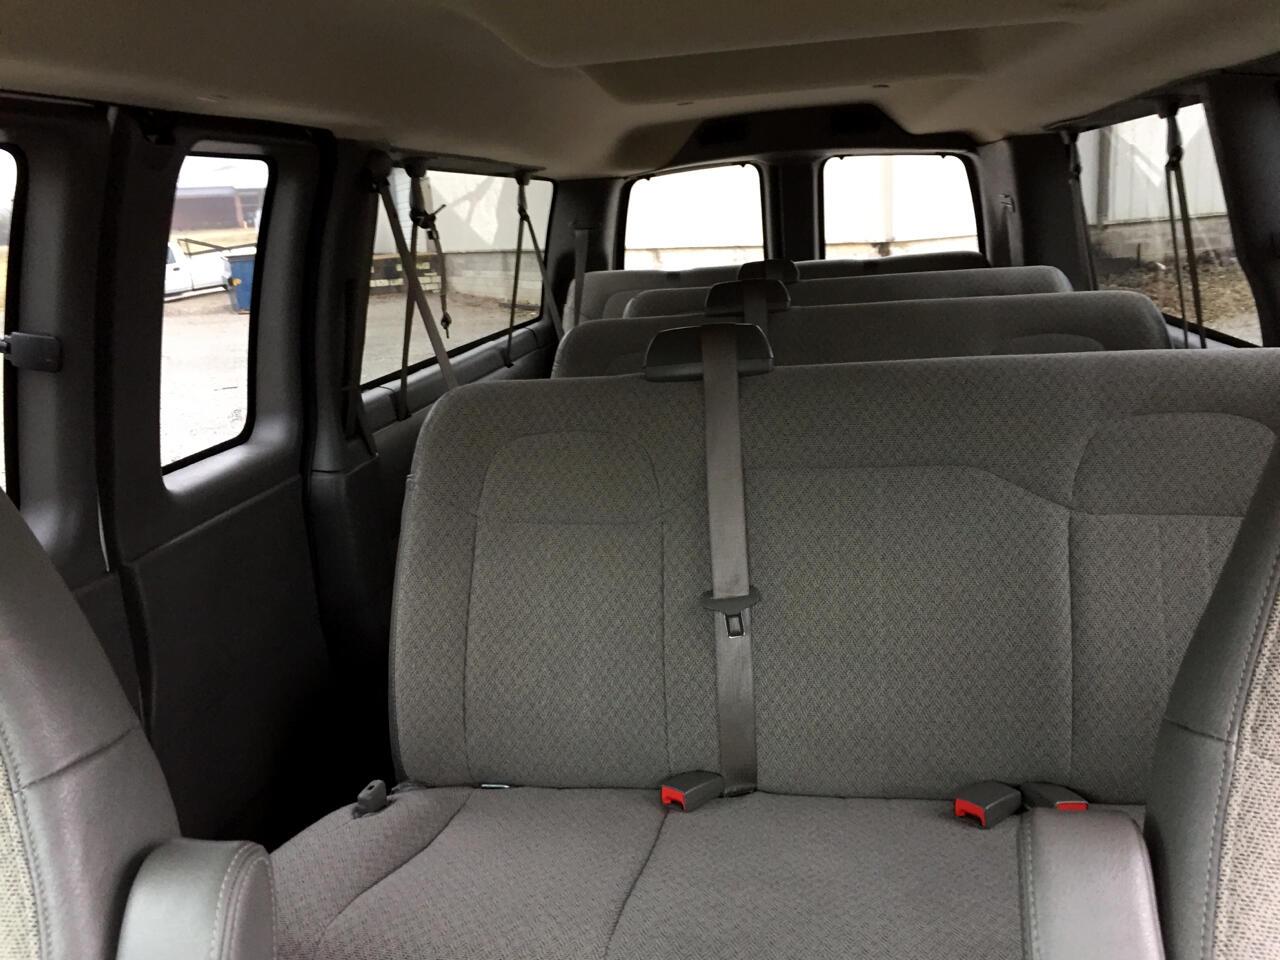 2017 Chevrolet Express RWD 3500 155